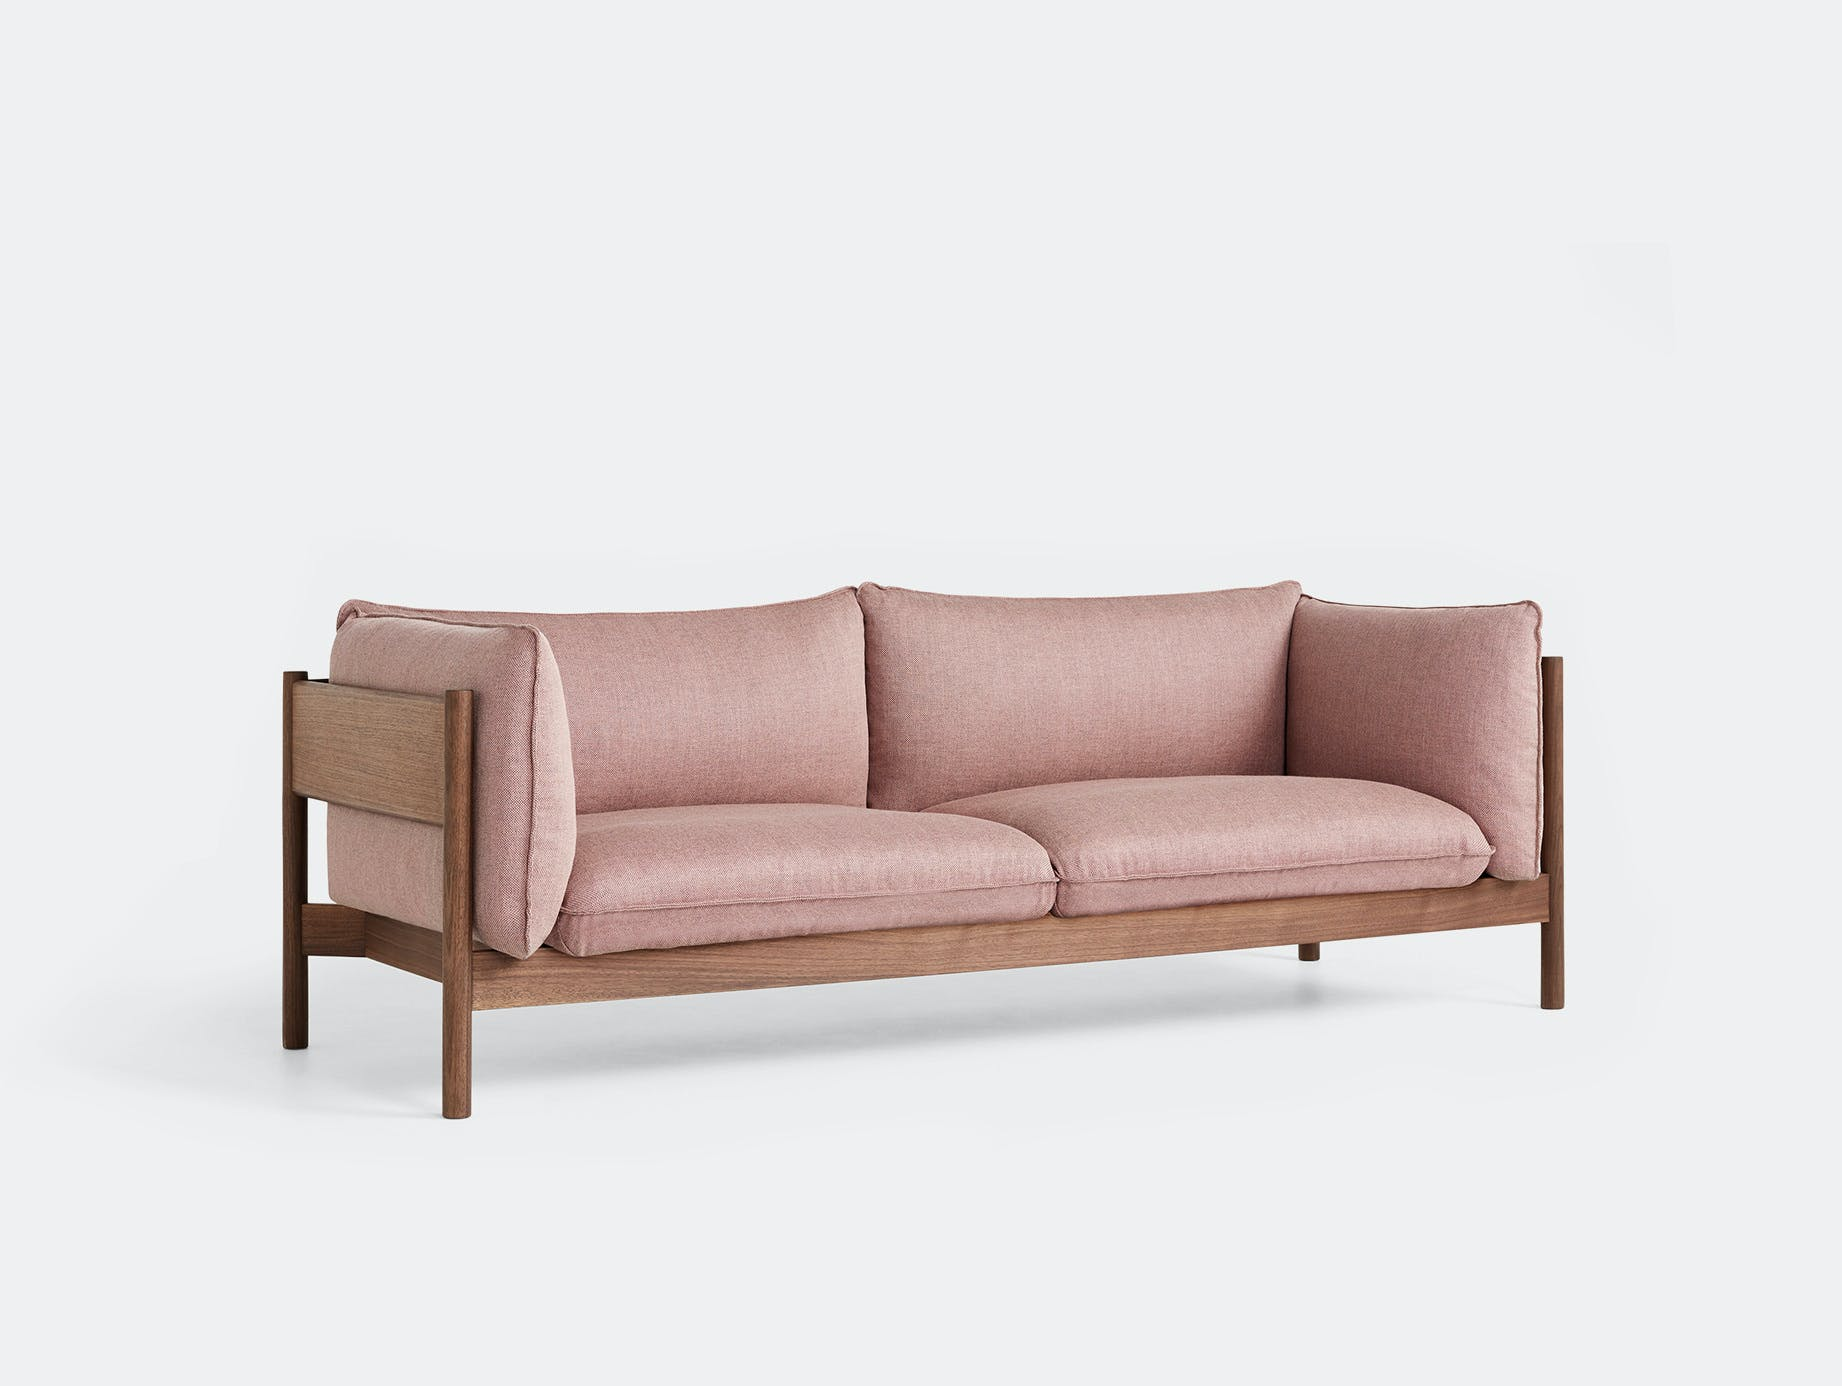 Hay arbour 3 seater sofa rewool 648 walnut